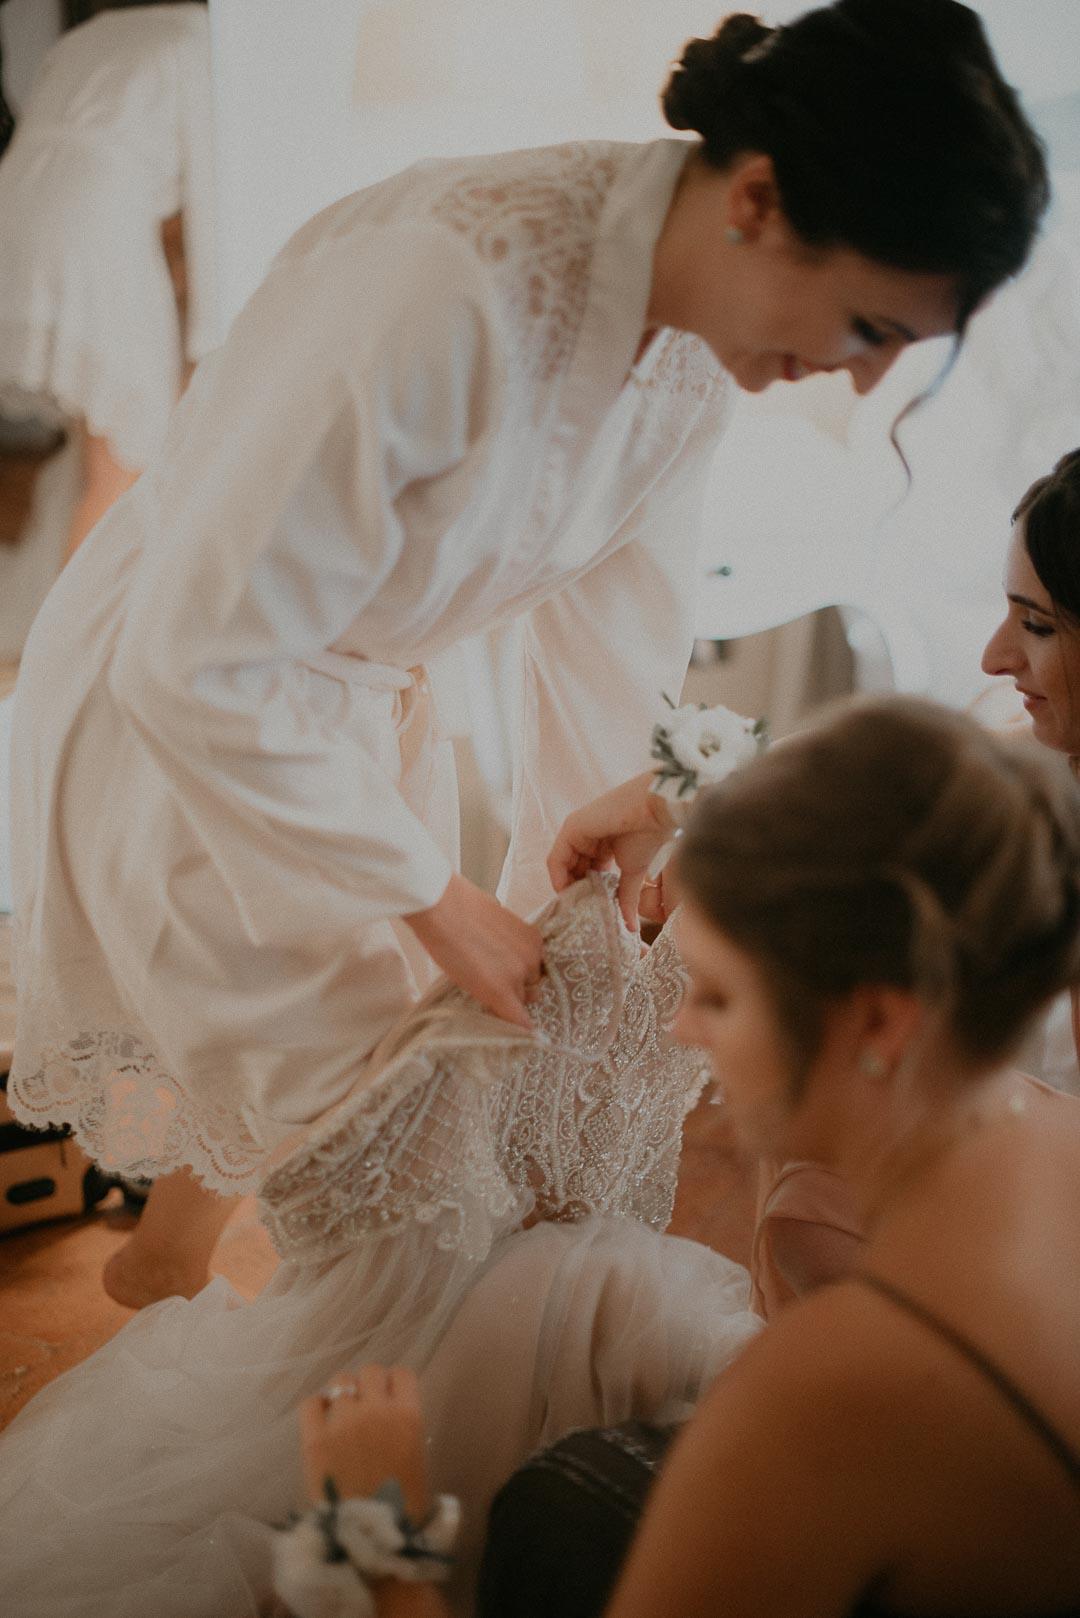 wedding-photographer-destination-fineart-bespoke-reportage-tuscany-villascorzi-vivianeizzo-spazio46-51